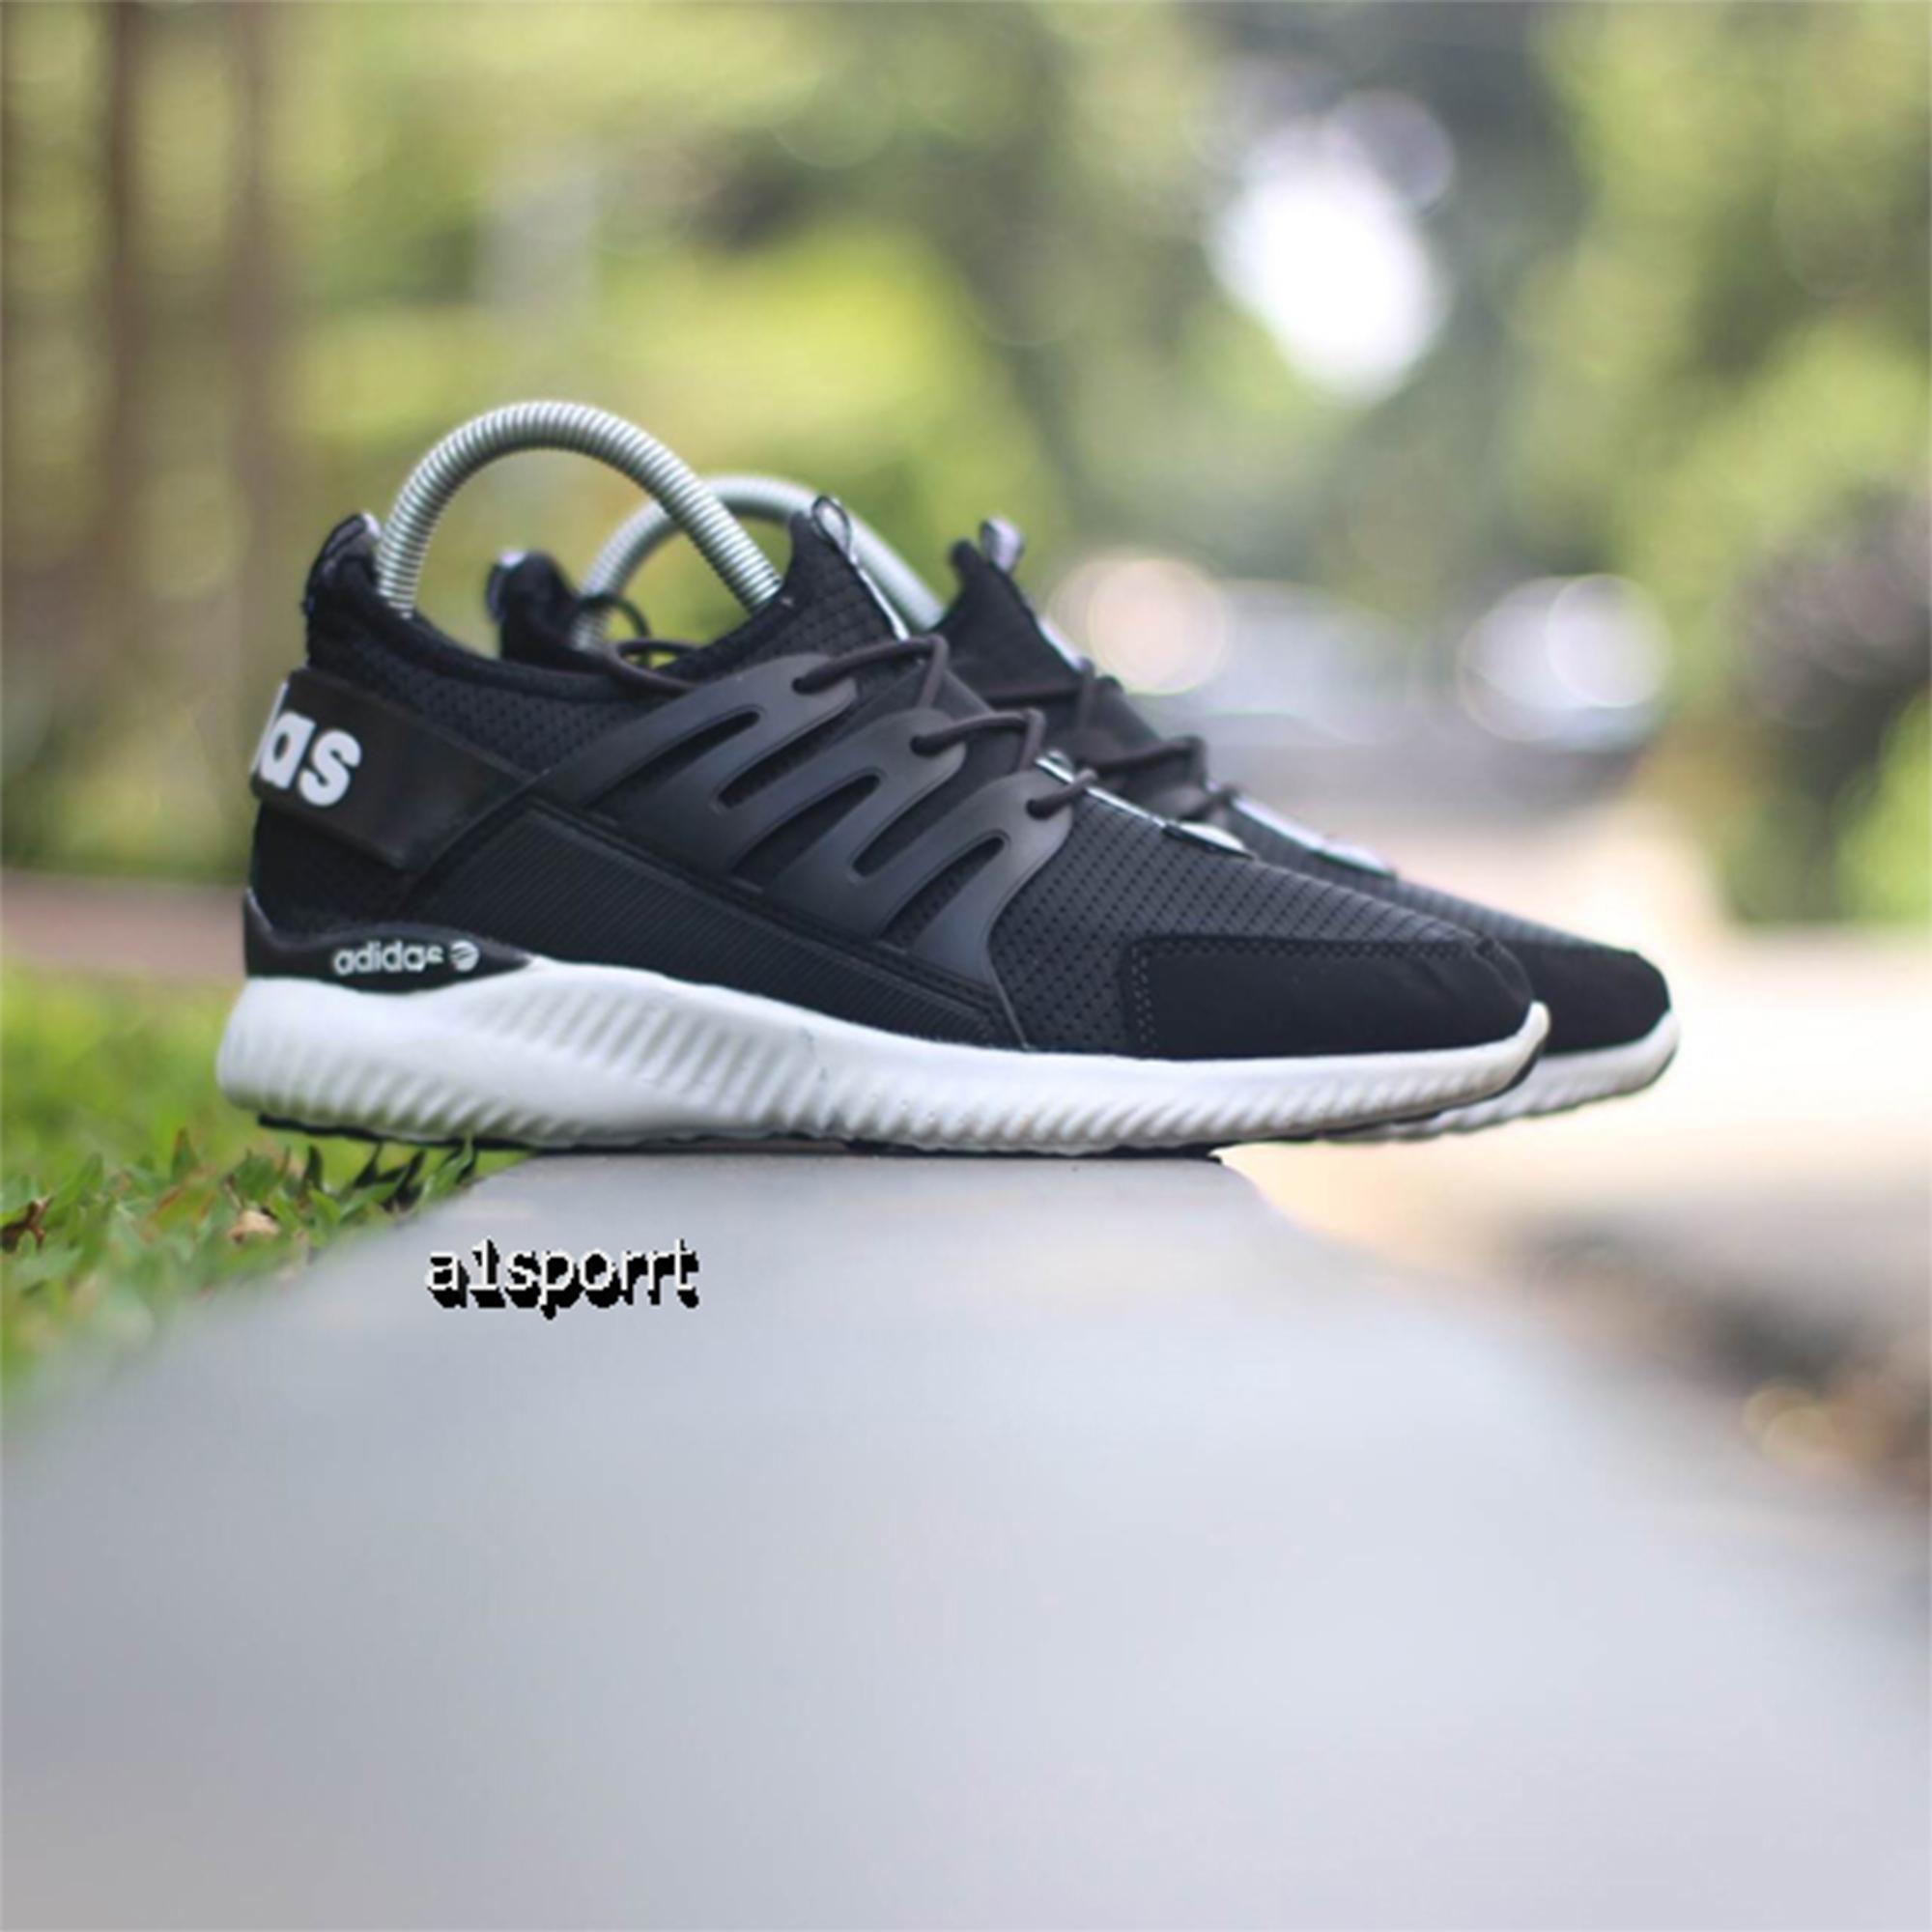 Sepatu Murah Adidas Alphabounce Kualitas Premium hitam sole putih